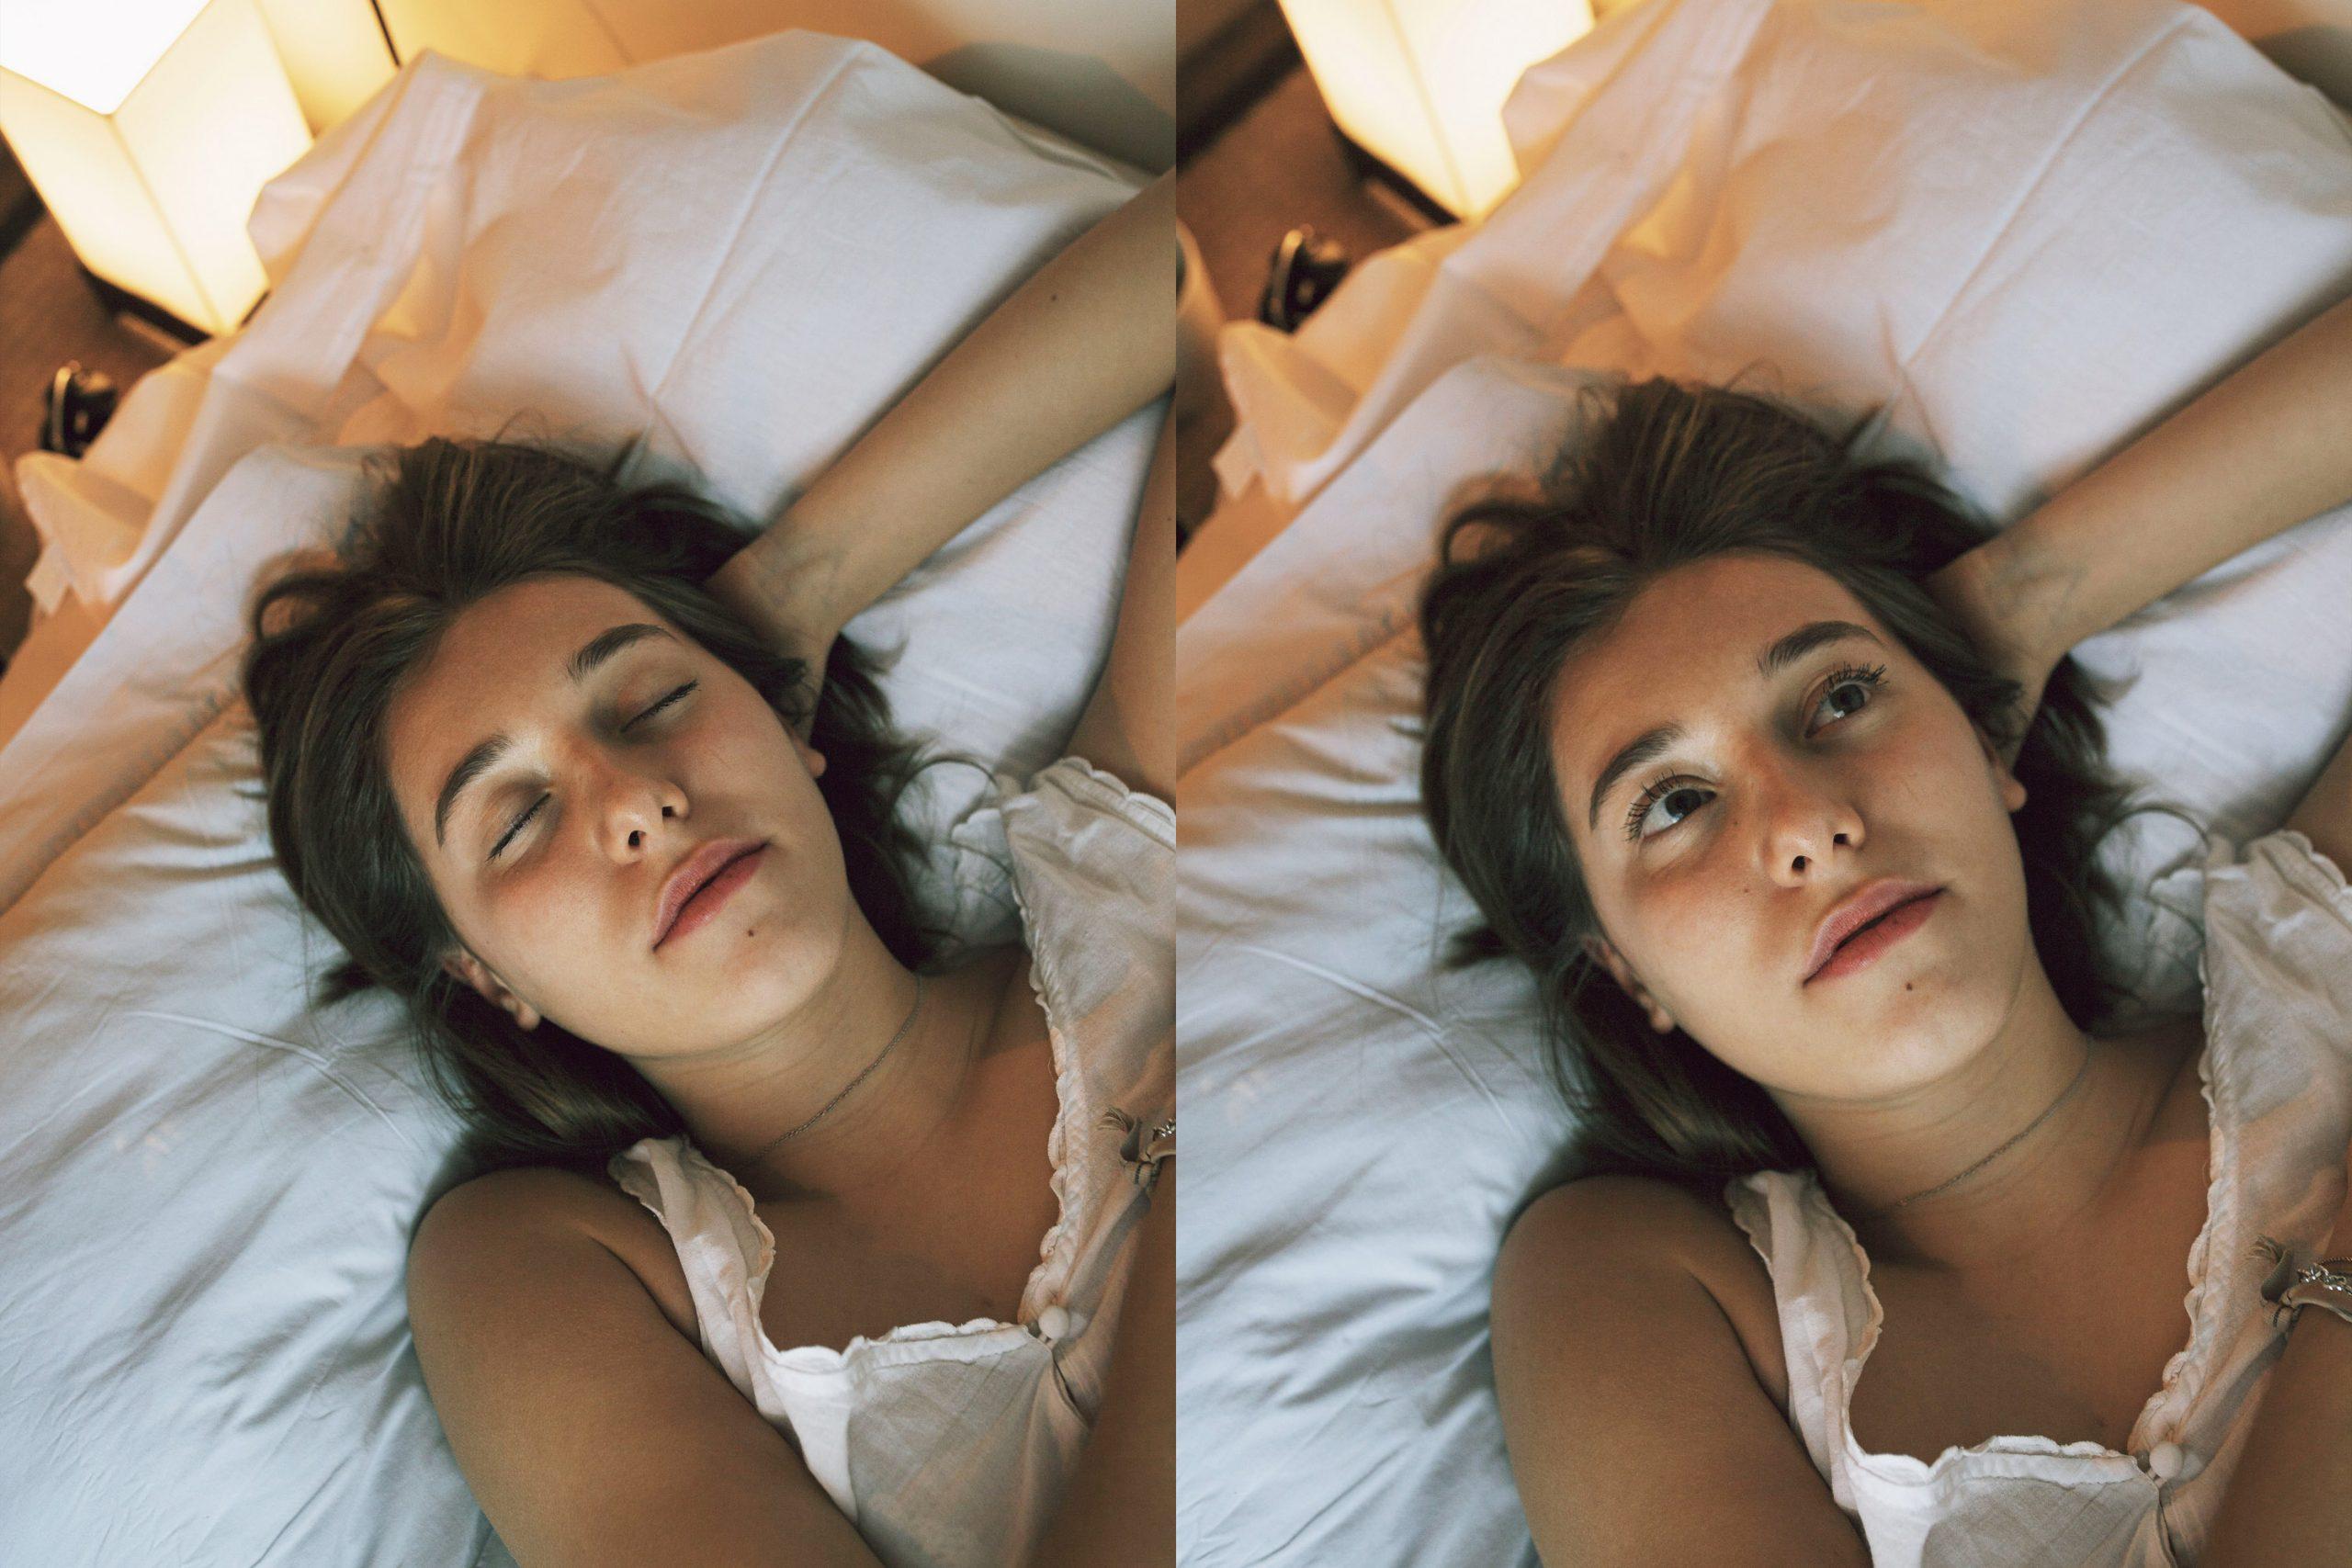 Categorie: Glamour, Portrait - Photographer: NICOLÒ CLERICI - Models: GAIA GIOVANELLI & ESTELLA TORCHIA - Mua: CELESTE TORCHIA - Assistant: MATTIA CARRARO - Location: Milano, MI, Italia